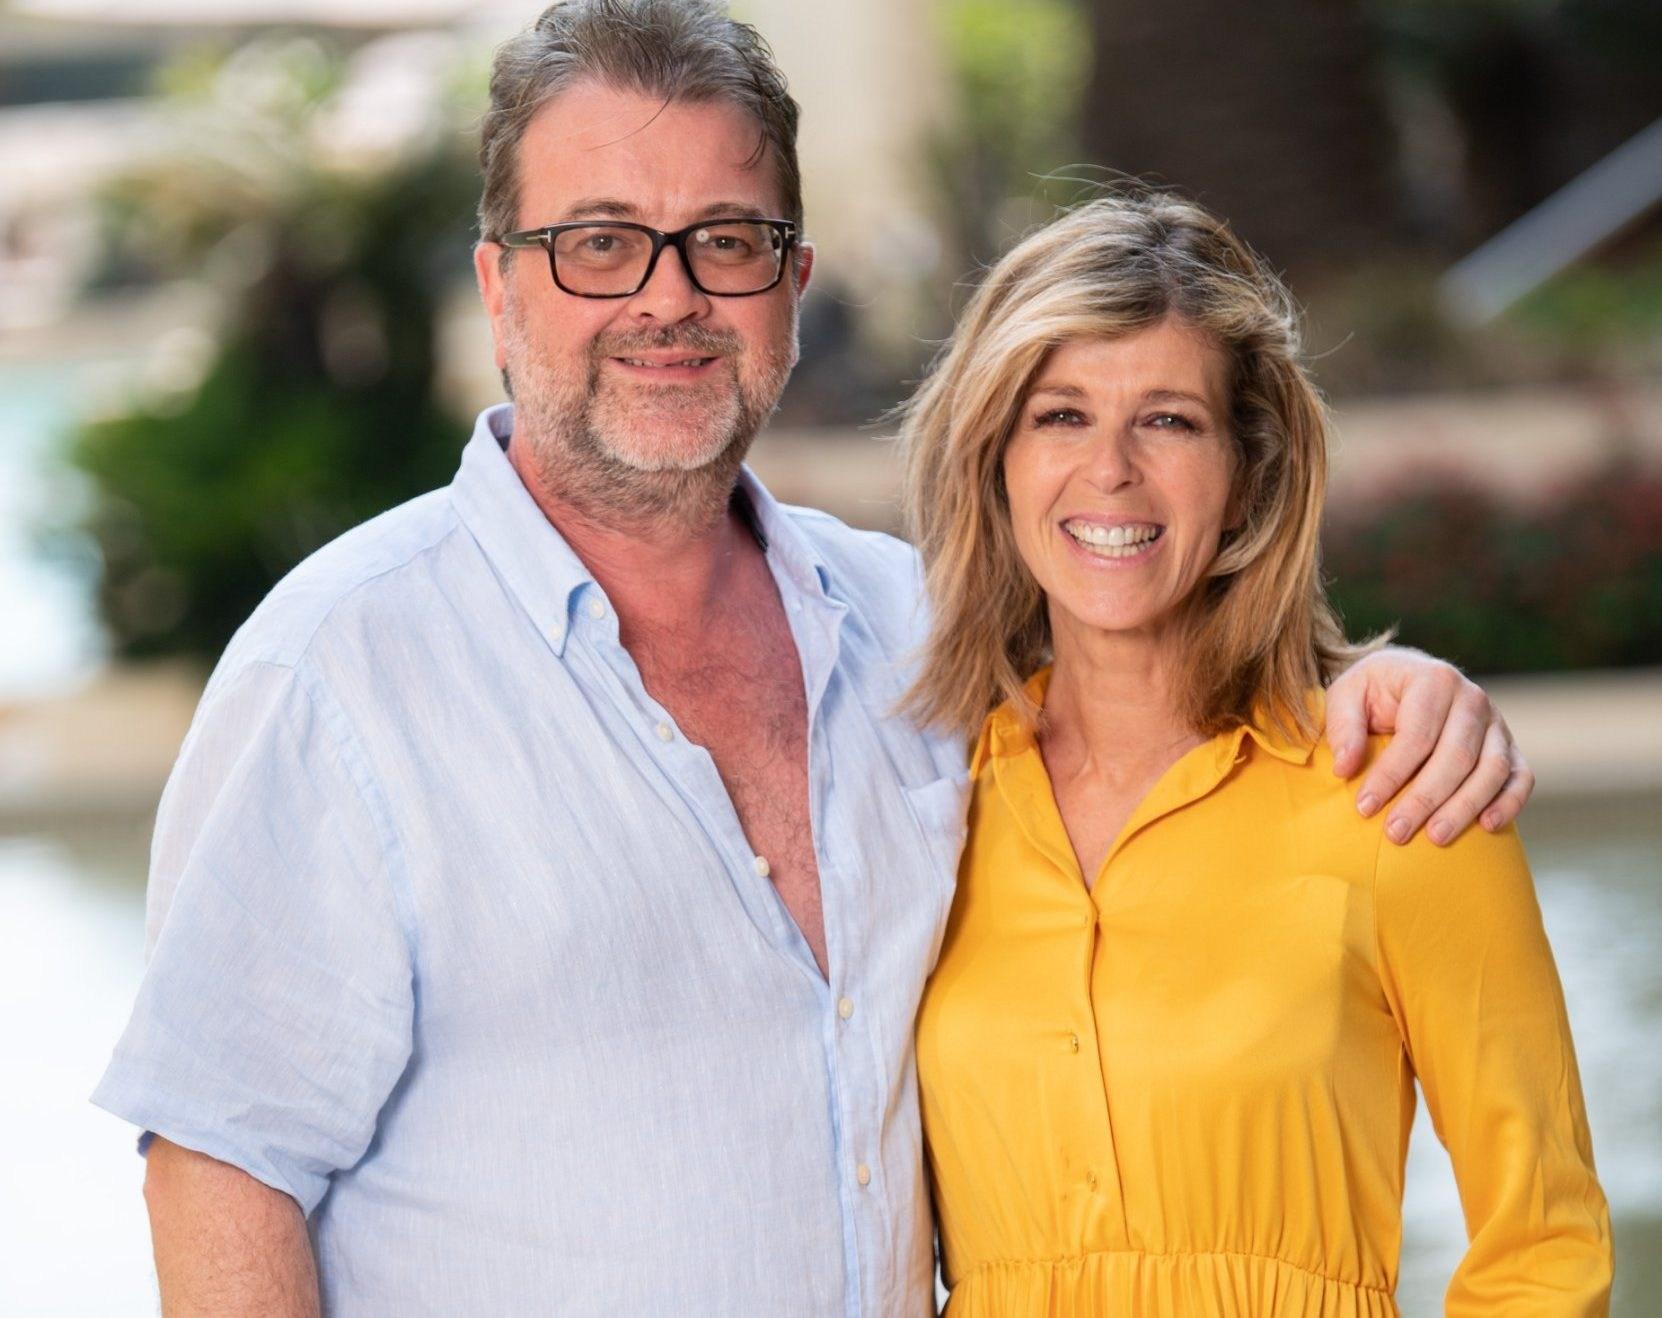 Kate Garraway on 'hardest time of life' as critically ill husband Derek battles coronavirus